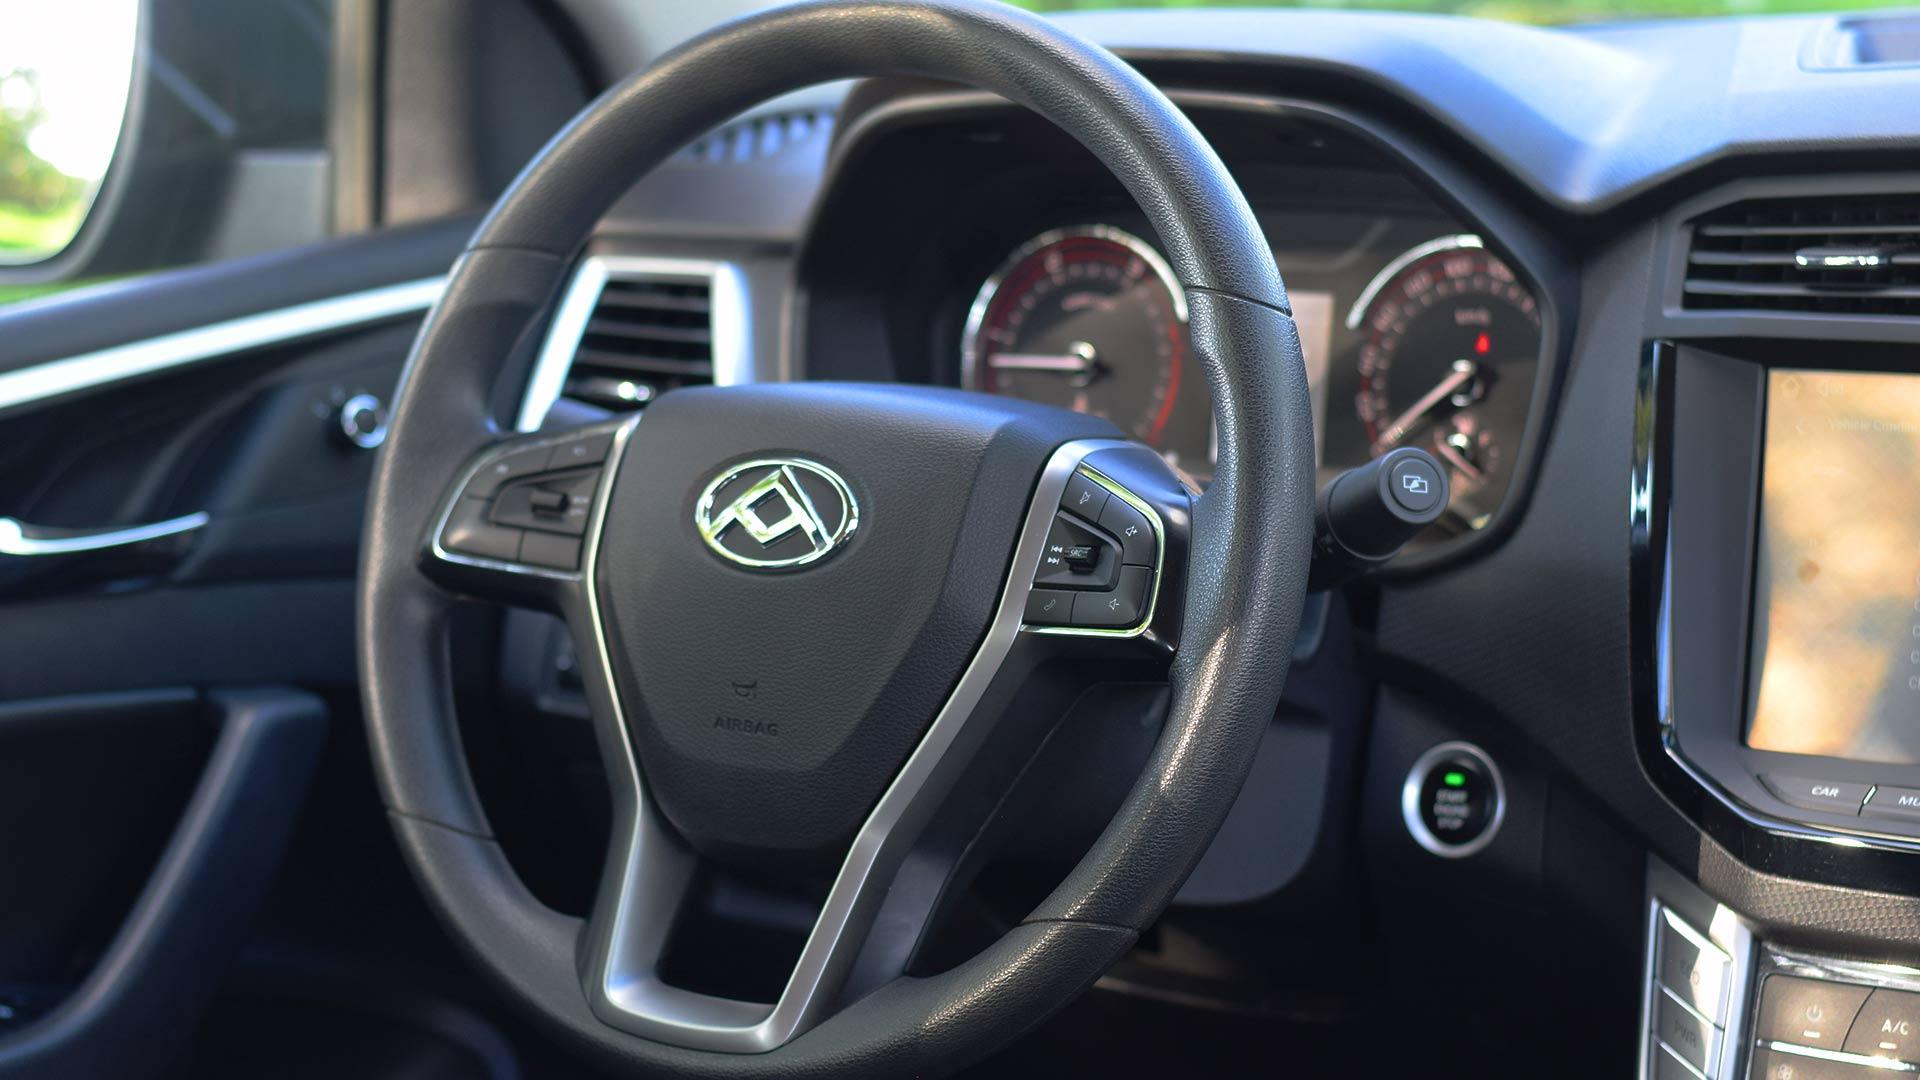 The Maxus T60 steering wheel